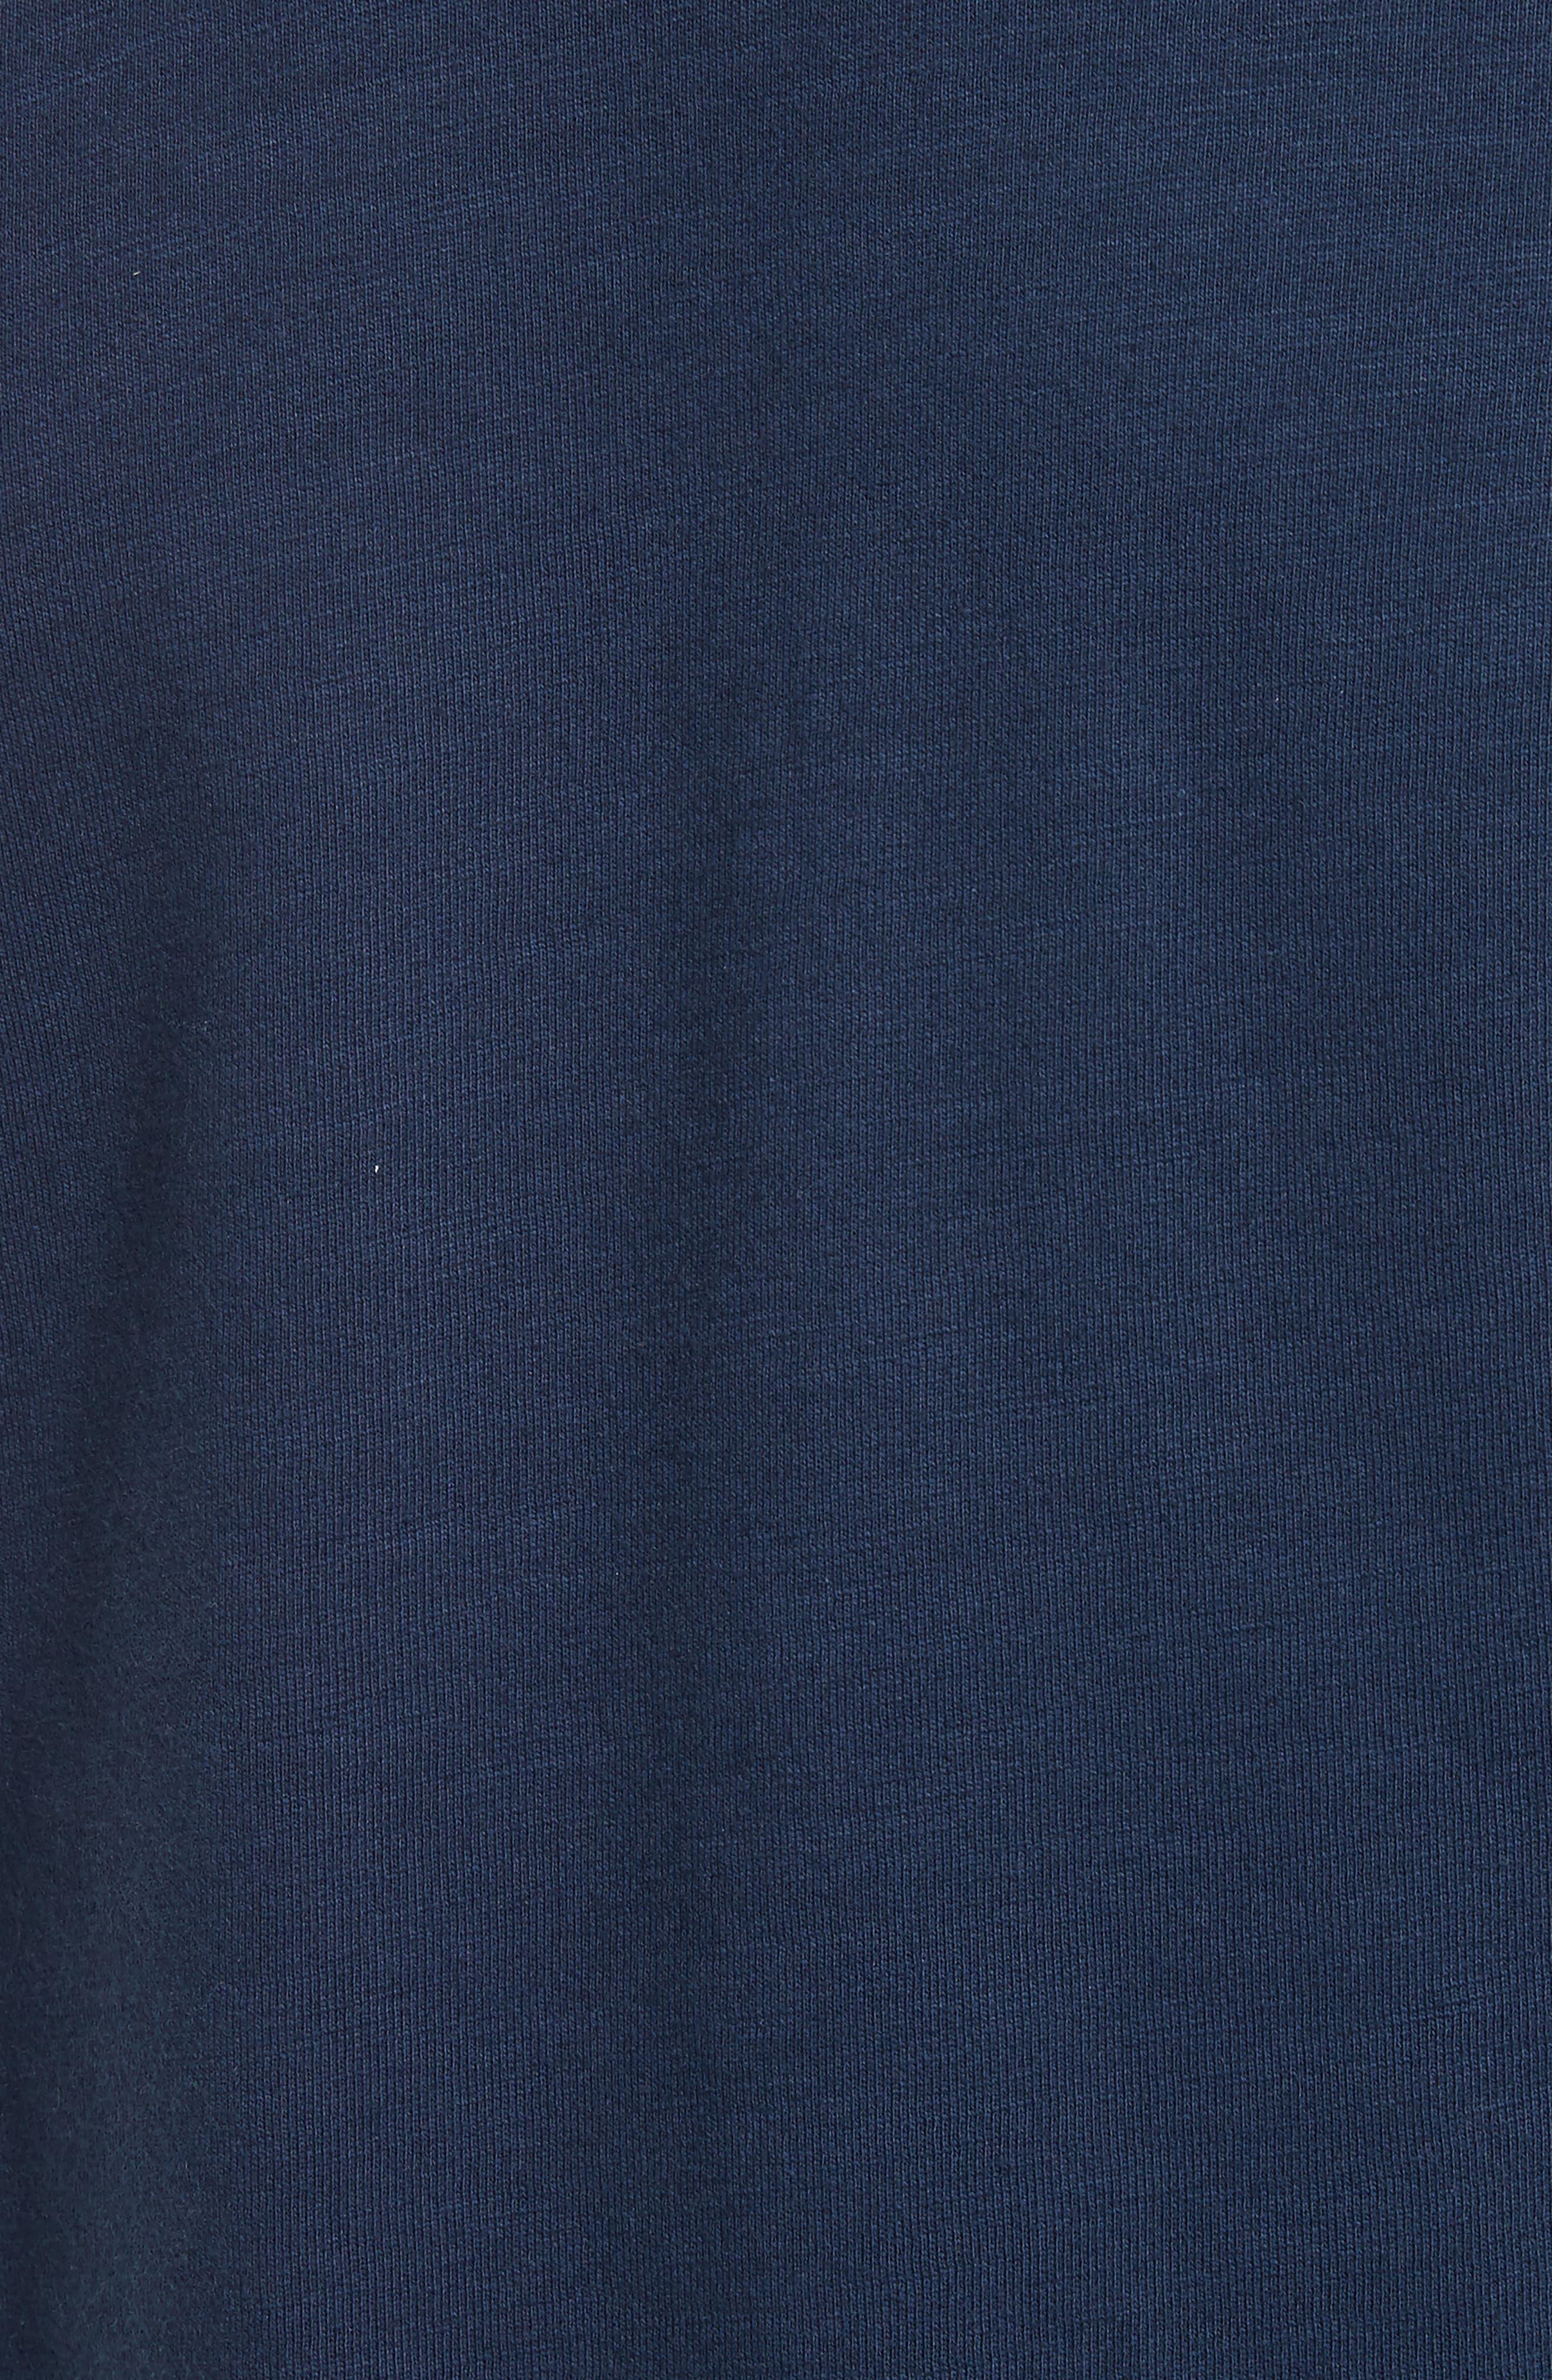 Standard Issue Crewneck Sweatshirt,                             Alternate thumbnail 14, color,